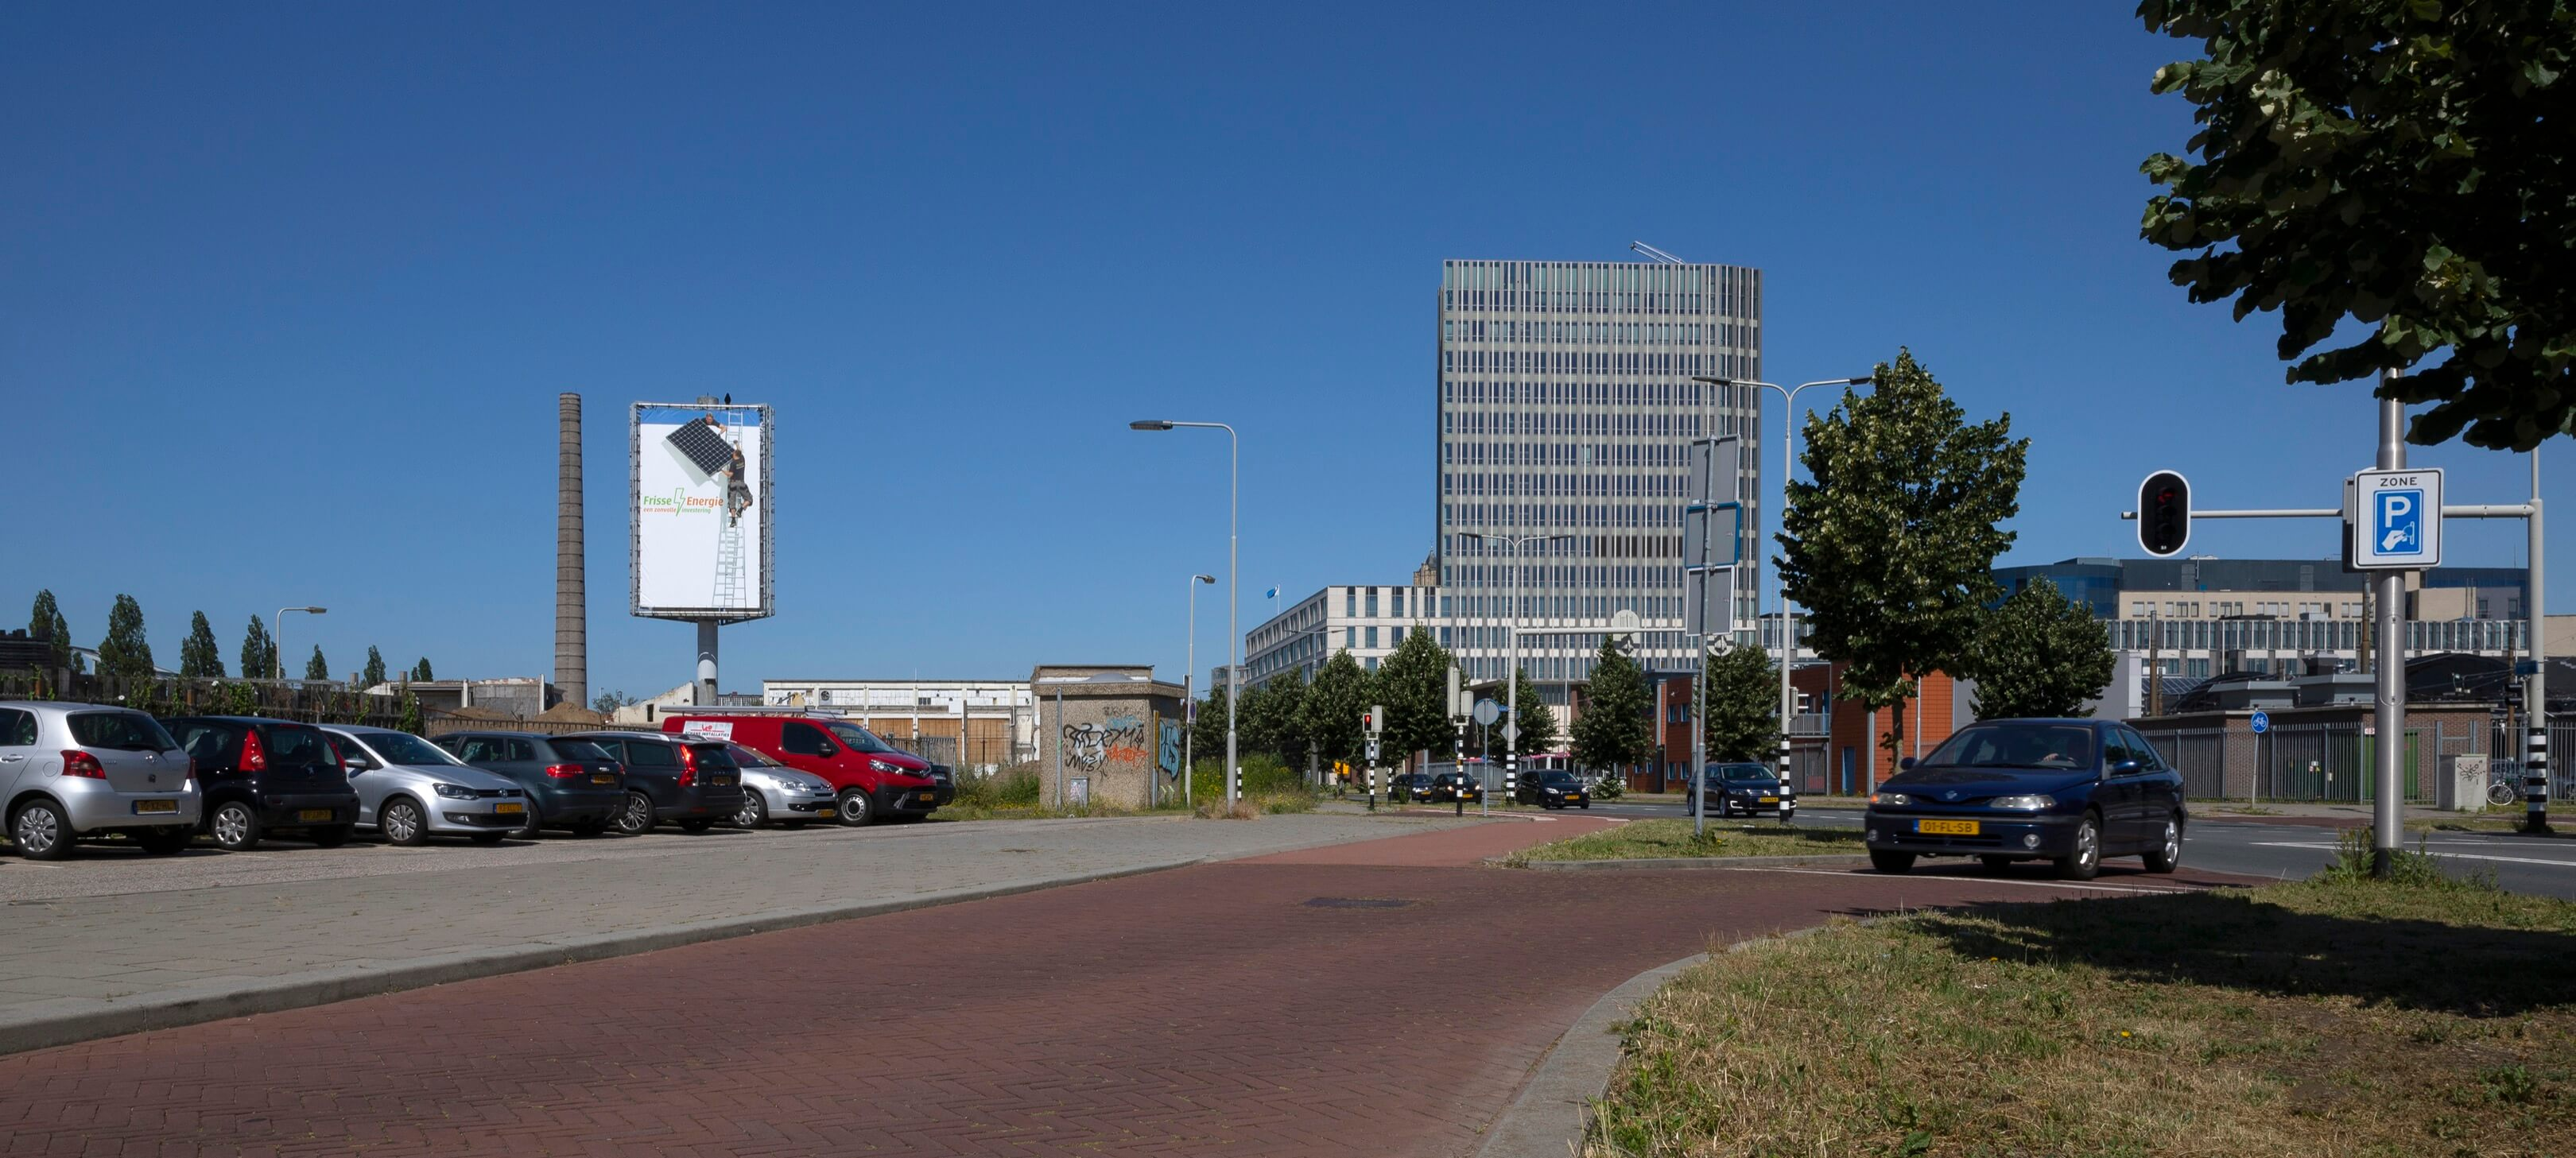 Frisse energie Jurjen Poeles fotografie campagne Arnhem billboard wildplakken grootformaat zonnepanelen groene energie toepassing